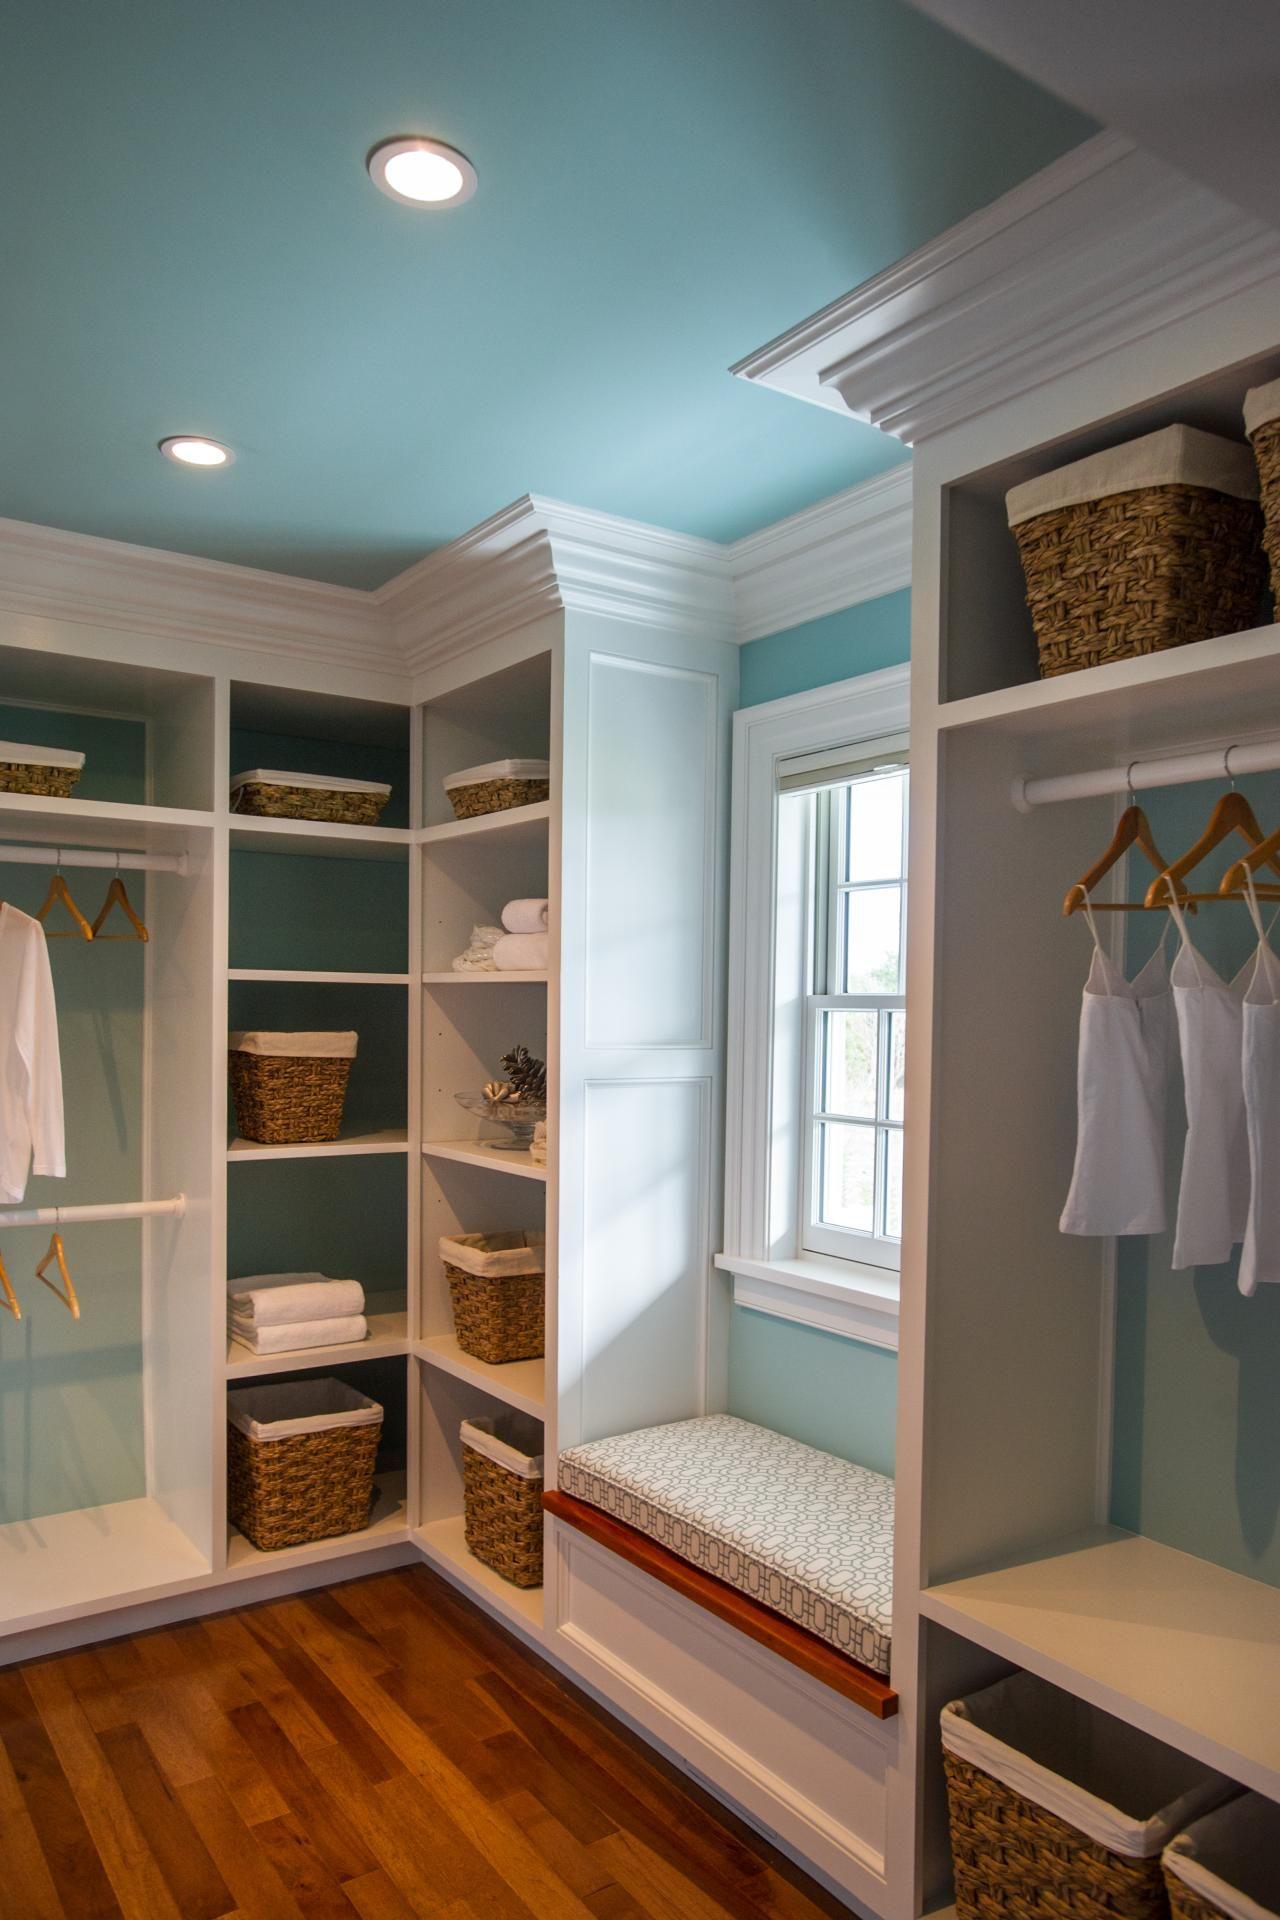 Closetspace A Cozy Window Seat Separates Custom Built Closet Units And Offers A Comforta Bedroom Closet Design Master Bedroom Closet Design Ideas Closet Units